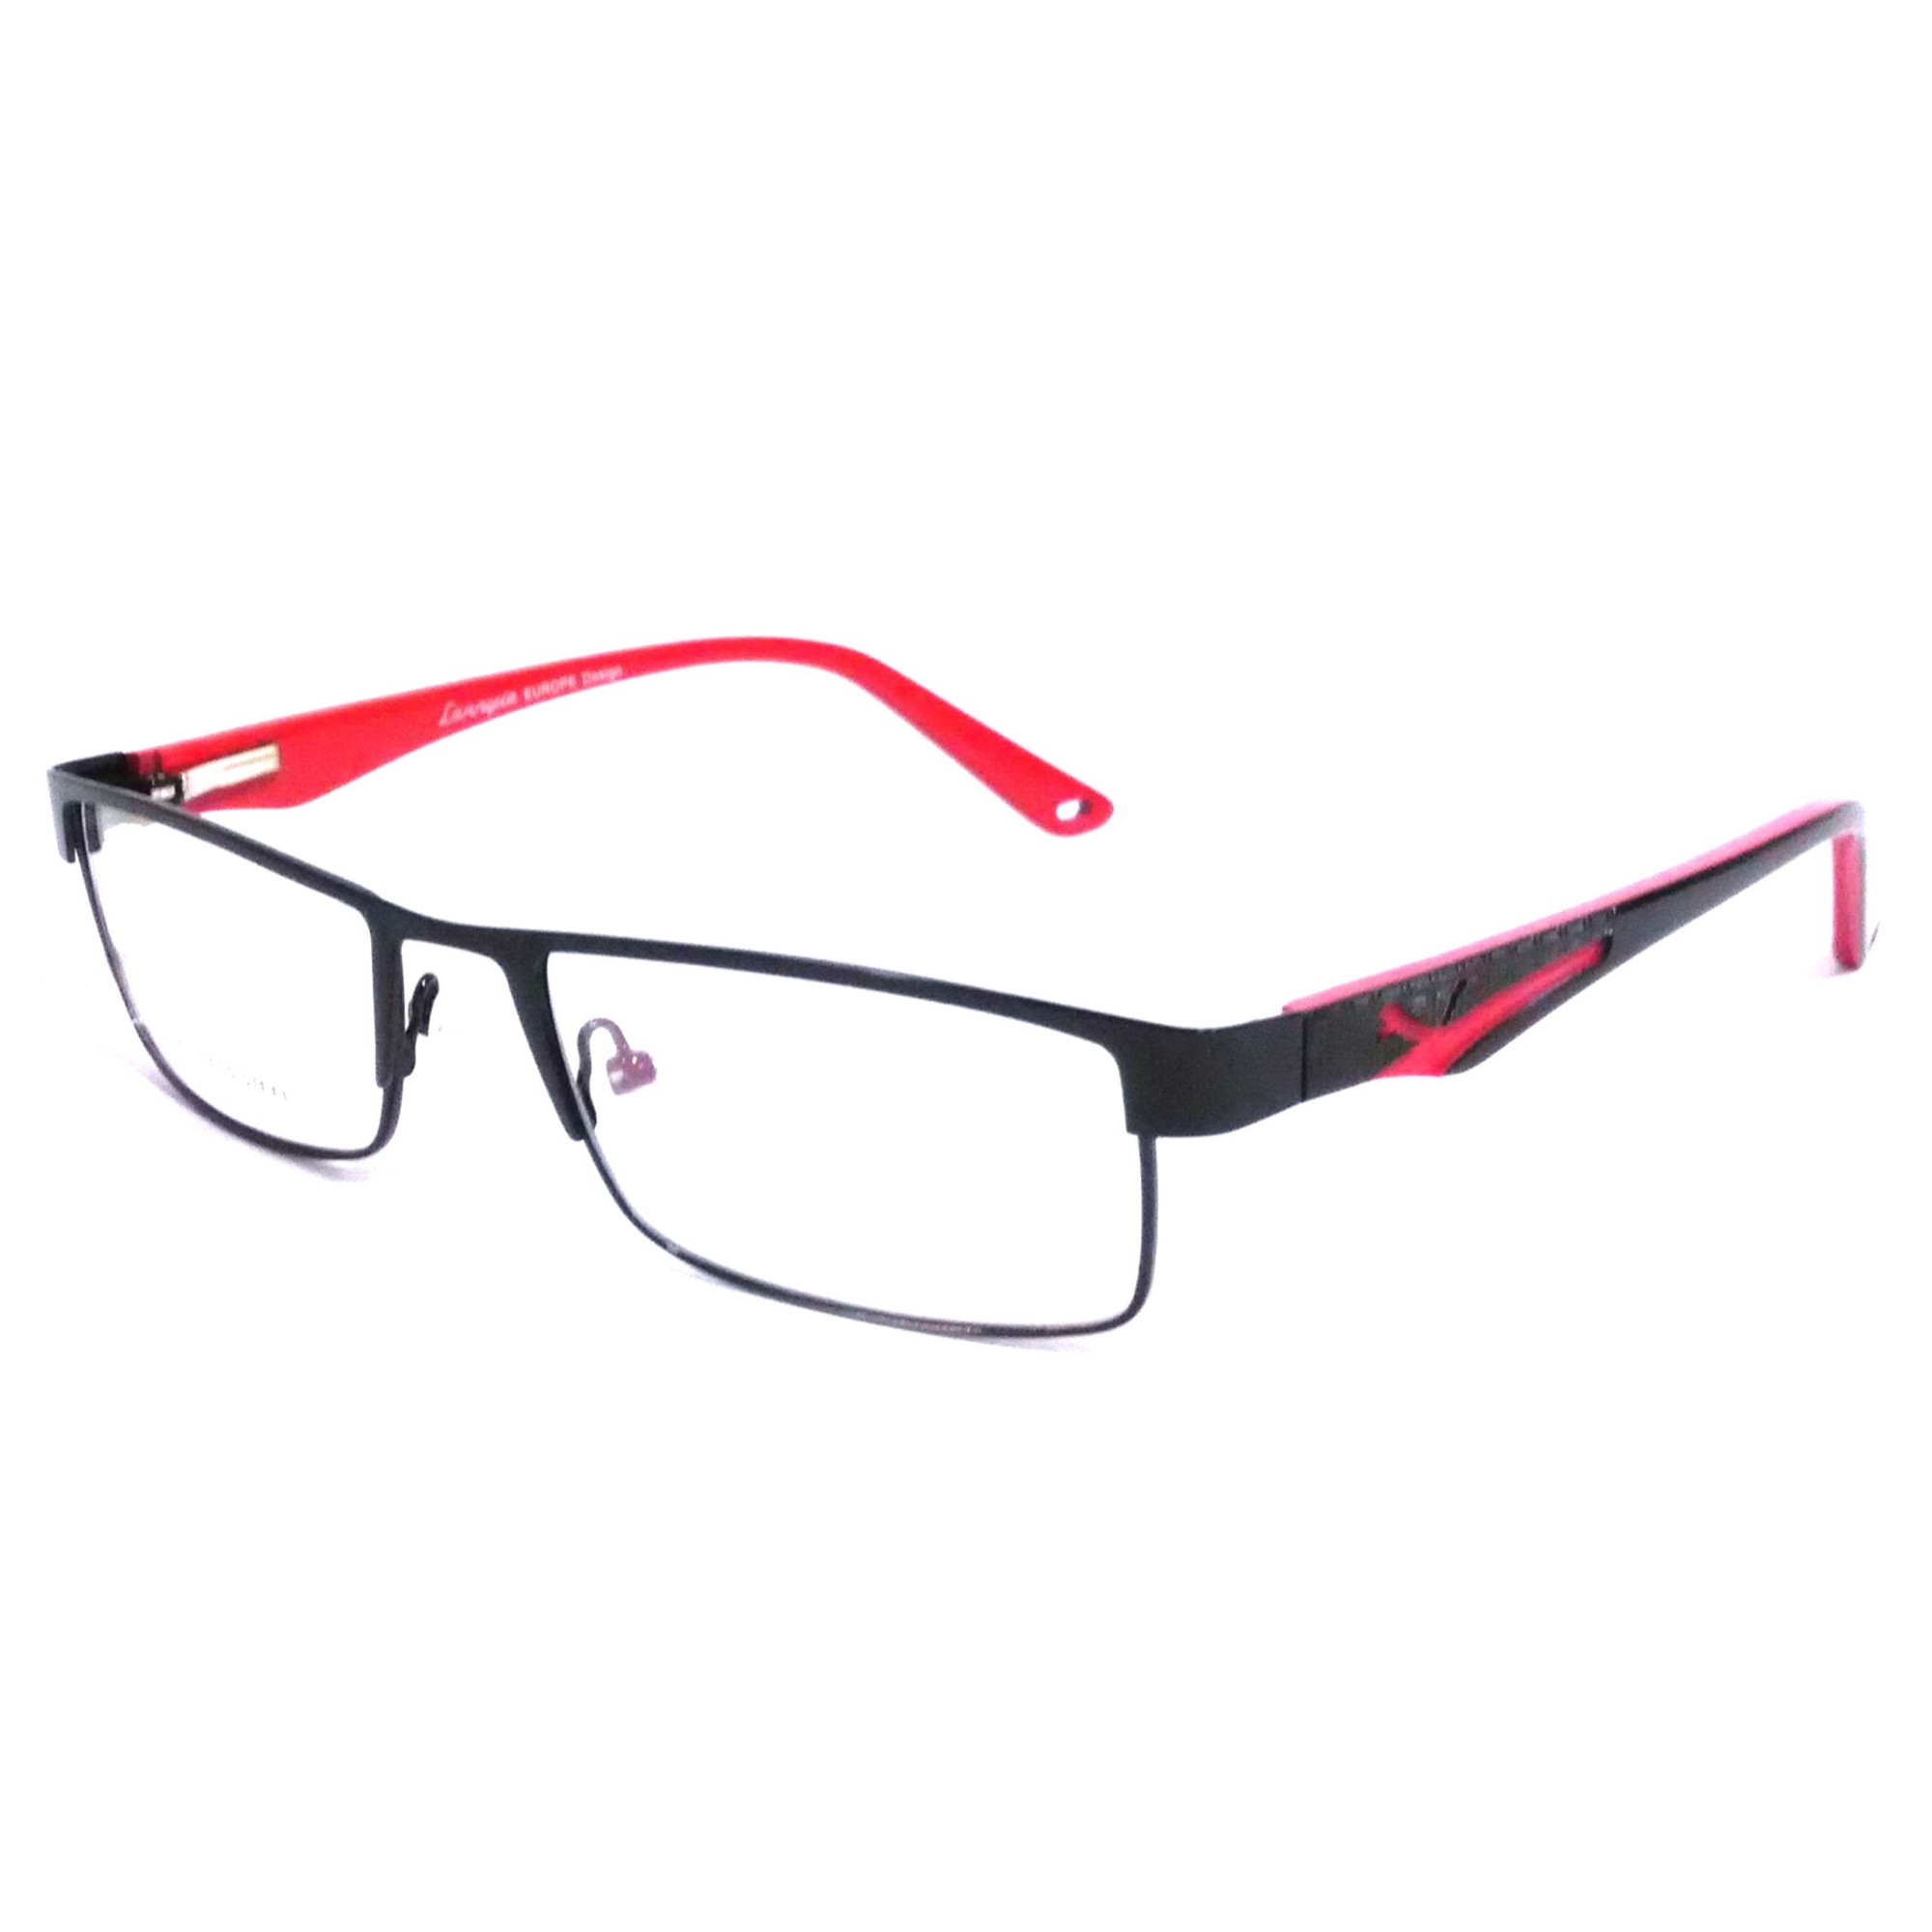 Blue Light Blocker Computer Glasses Anti Blue Ray Eyeglasses 1168RD